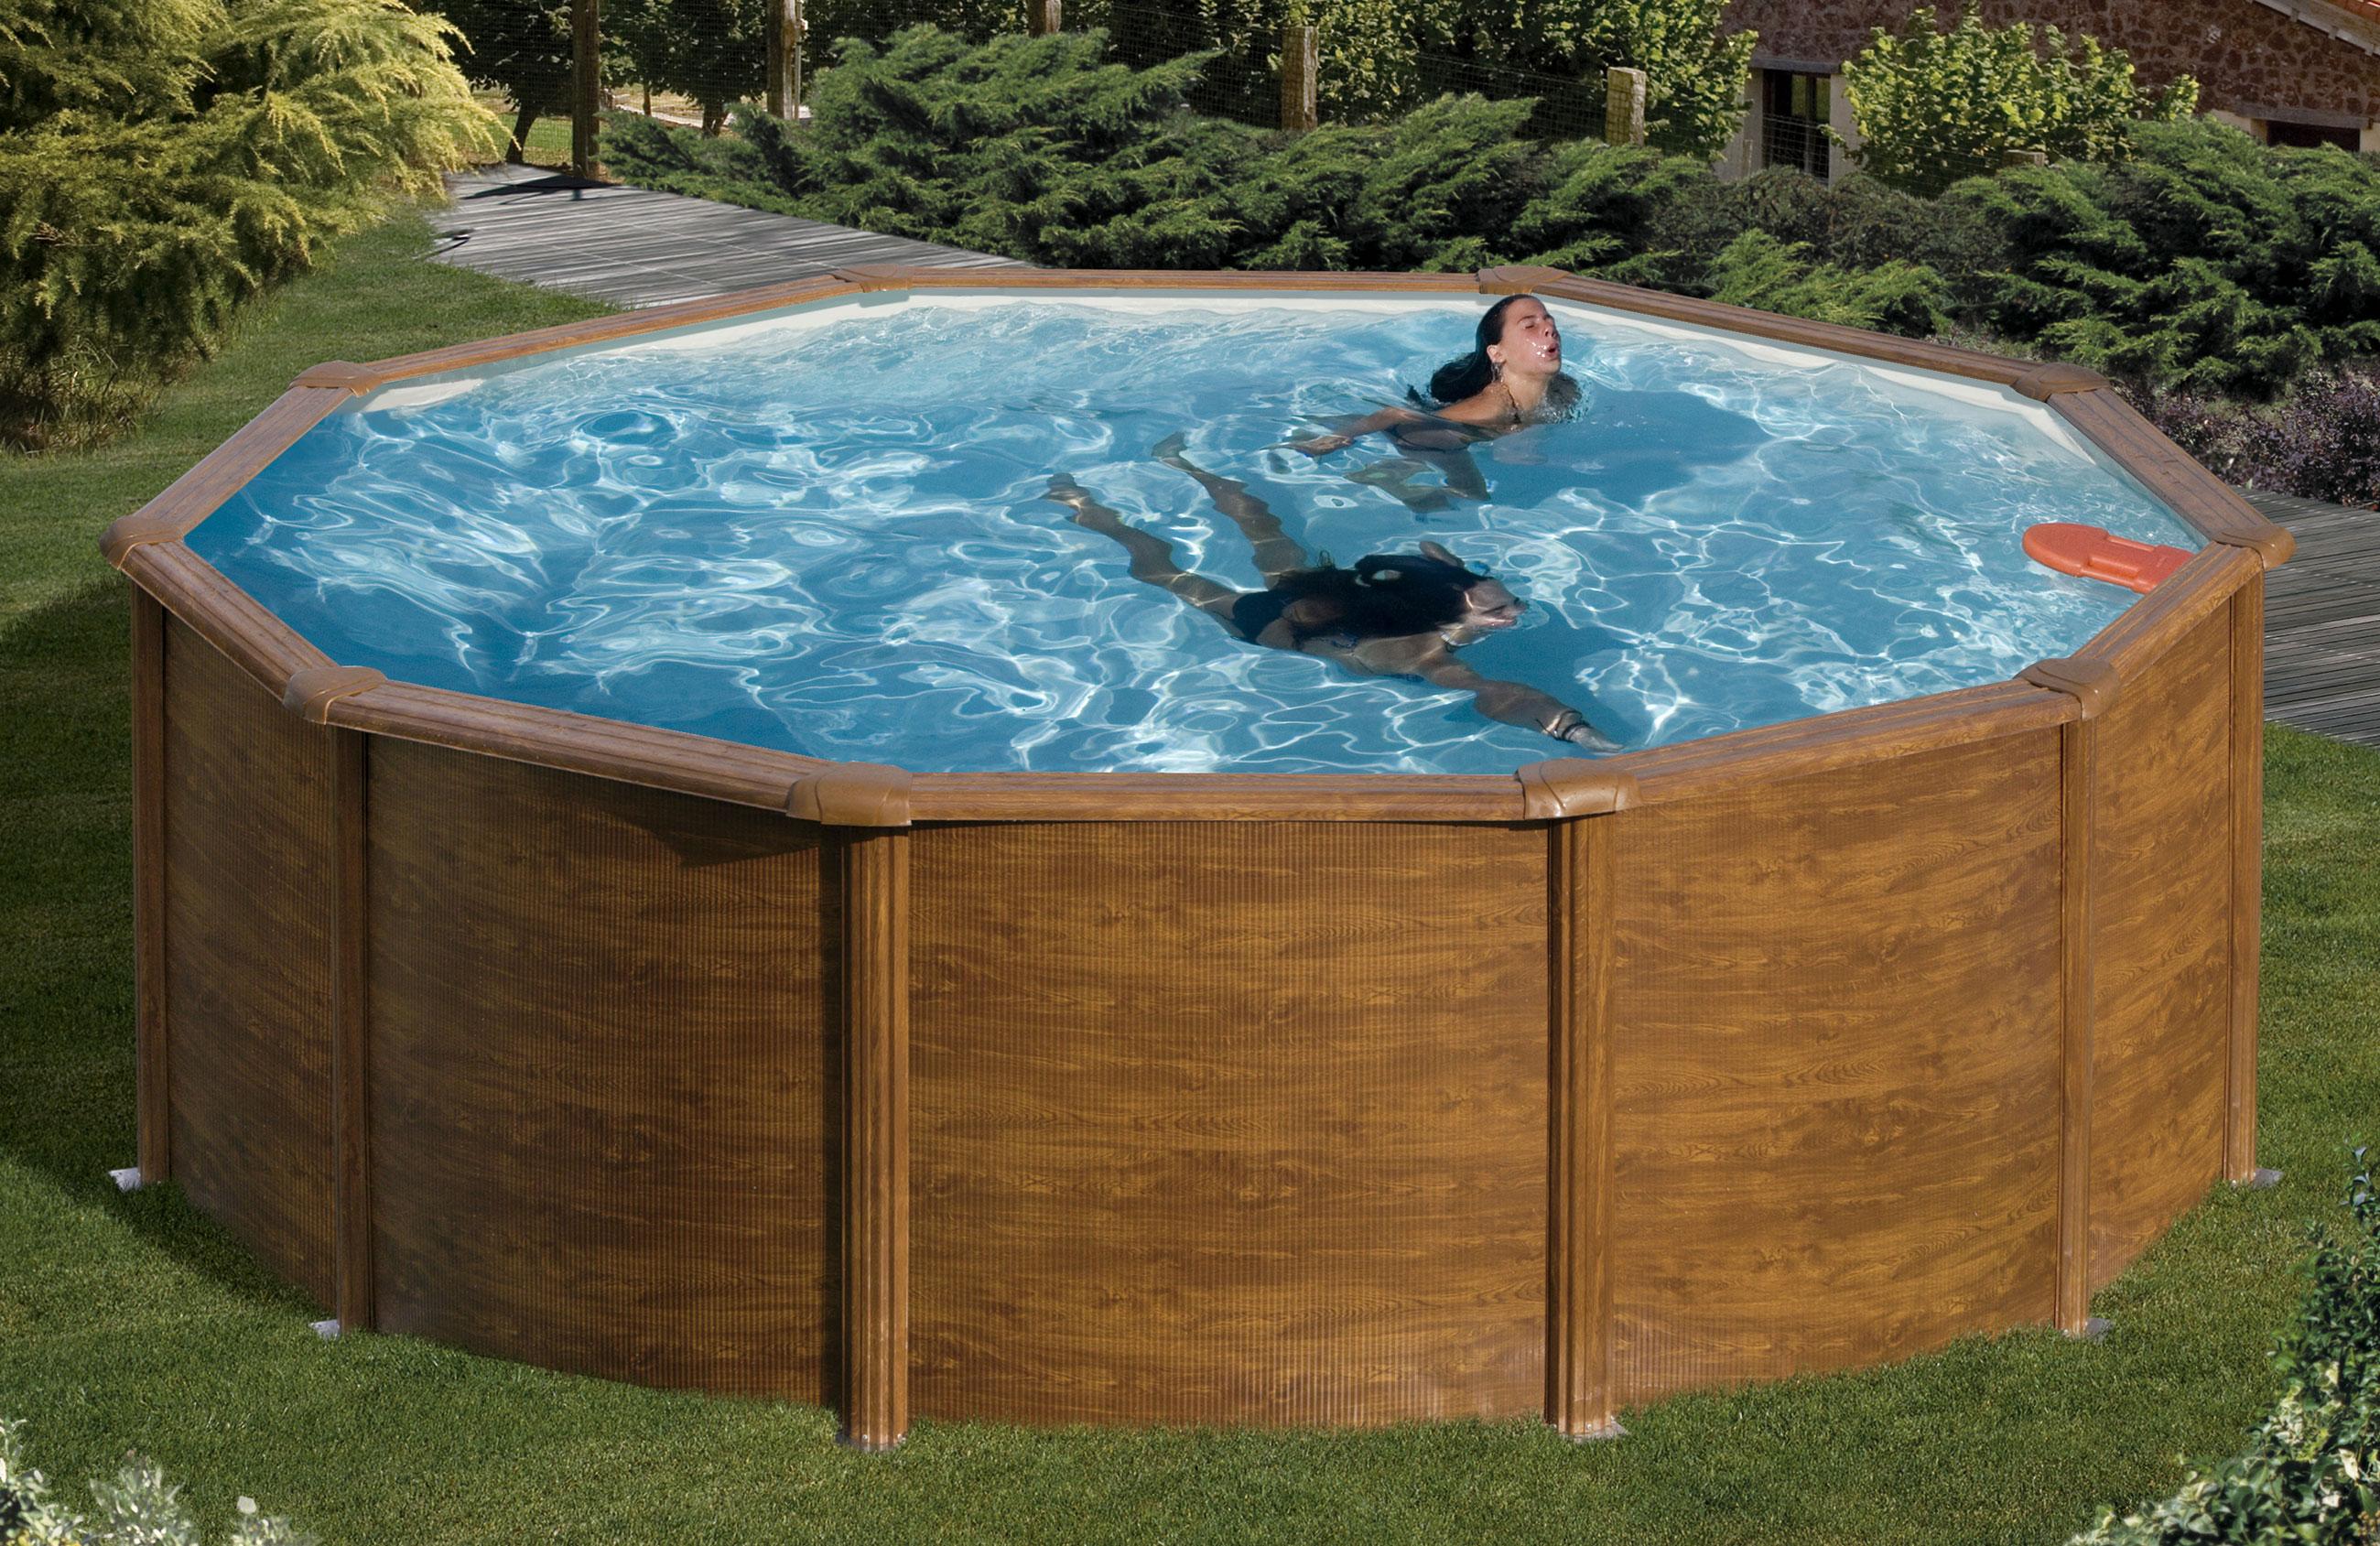 Pool schwimmbecken feeling holzoptik rund mit sandfilter for Pool holzoptik metall